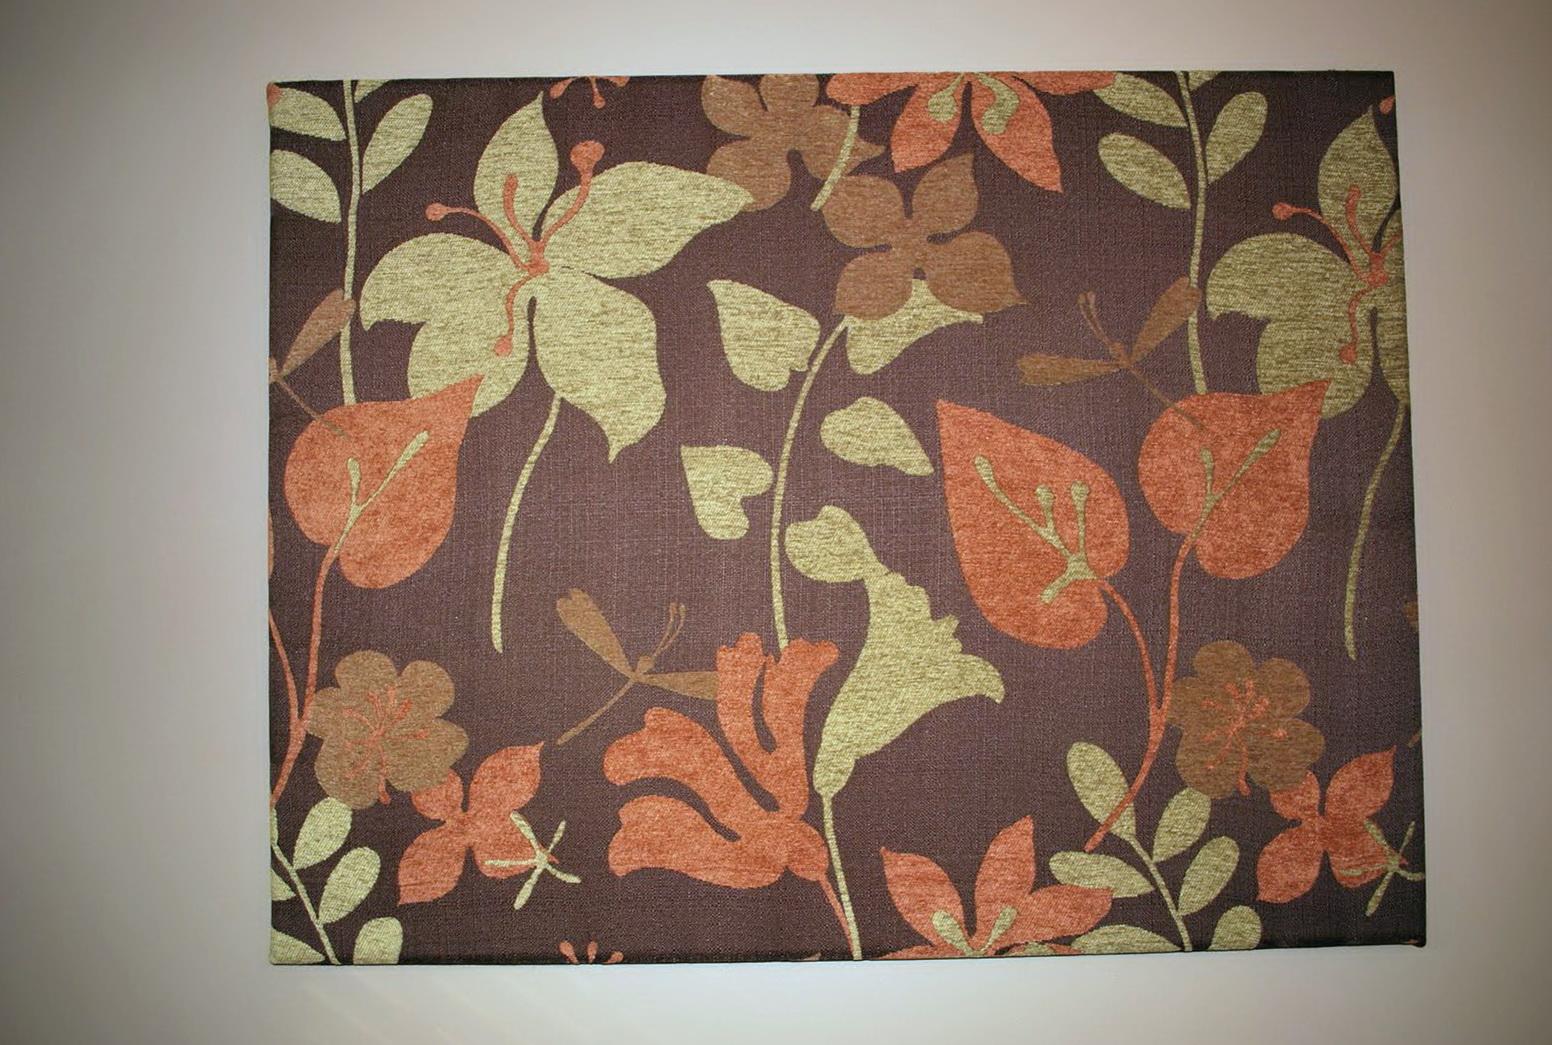 Marimekko Fabric Wall Art